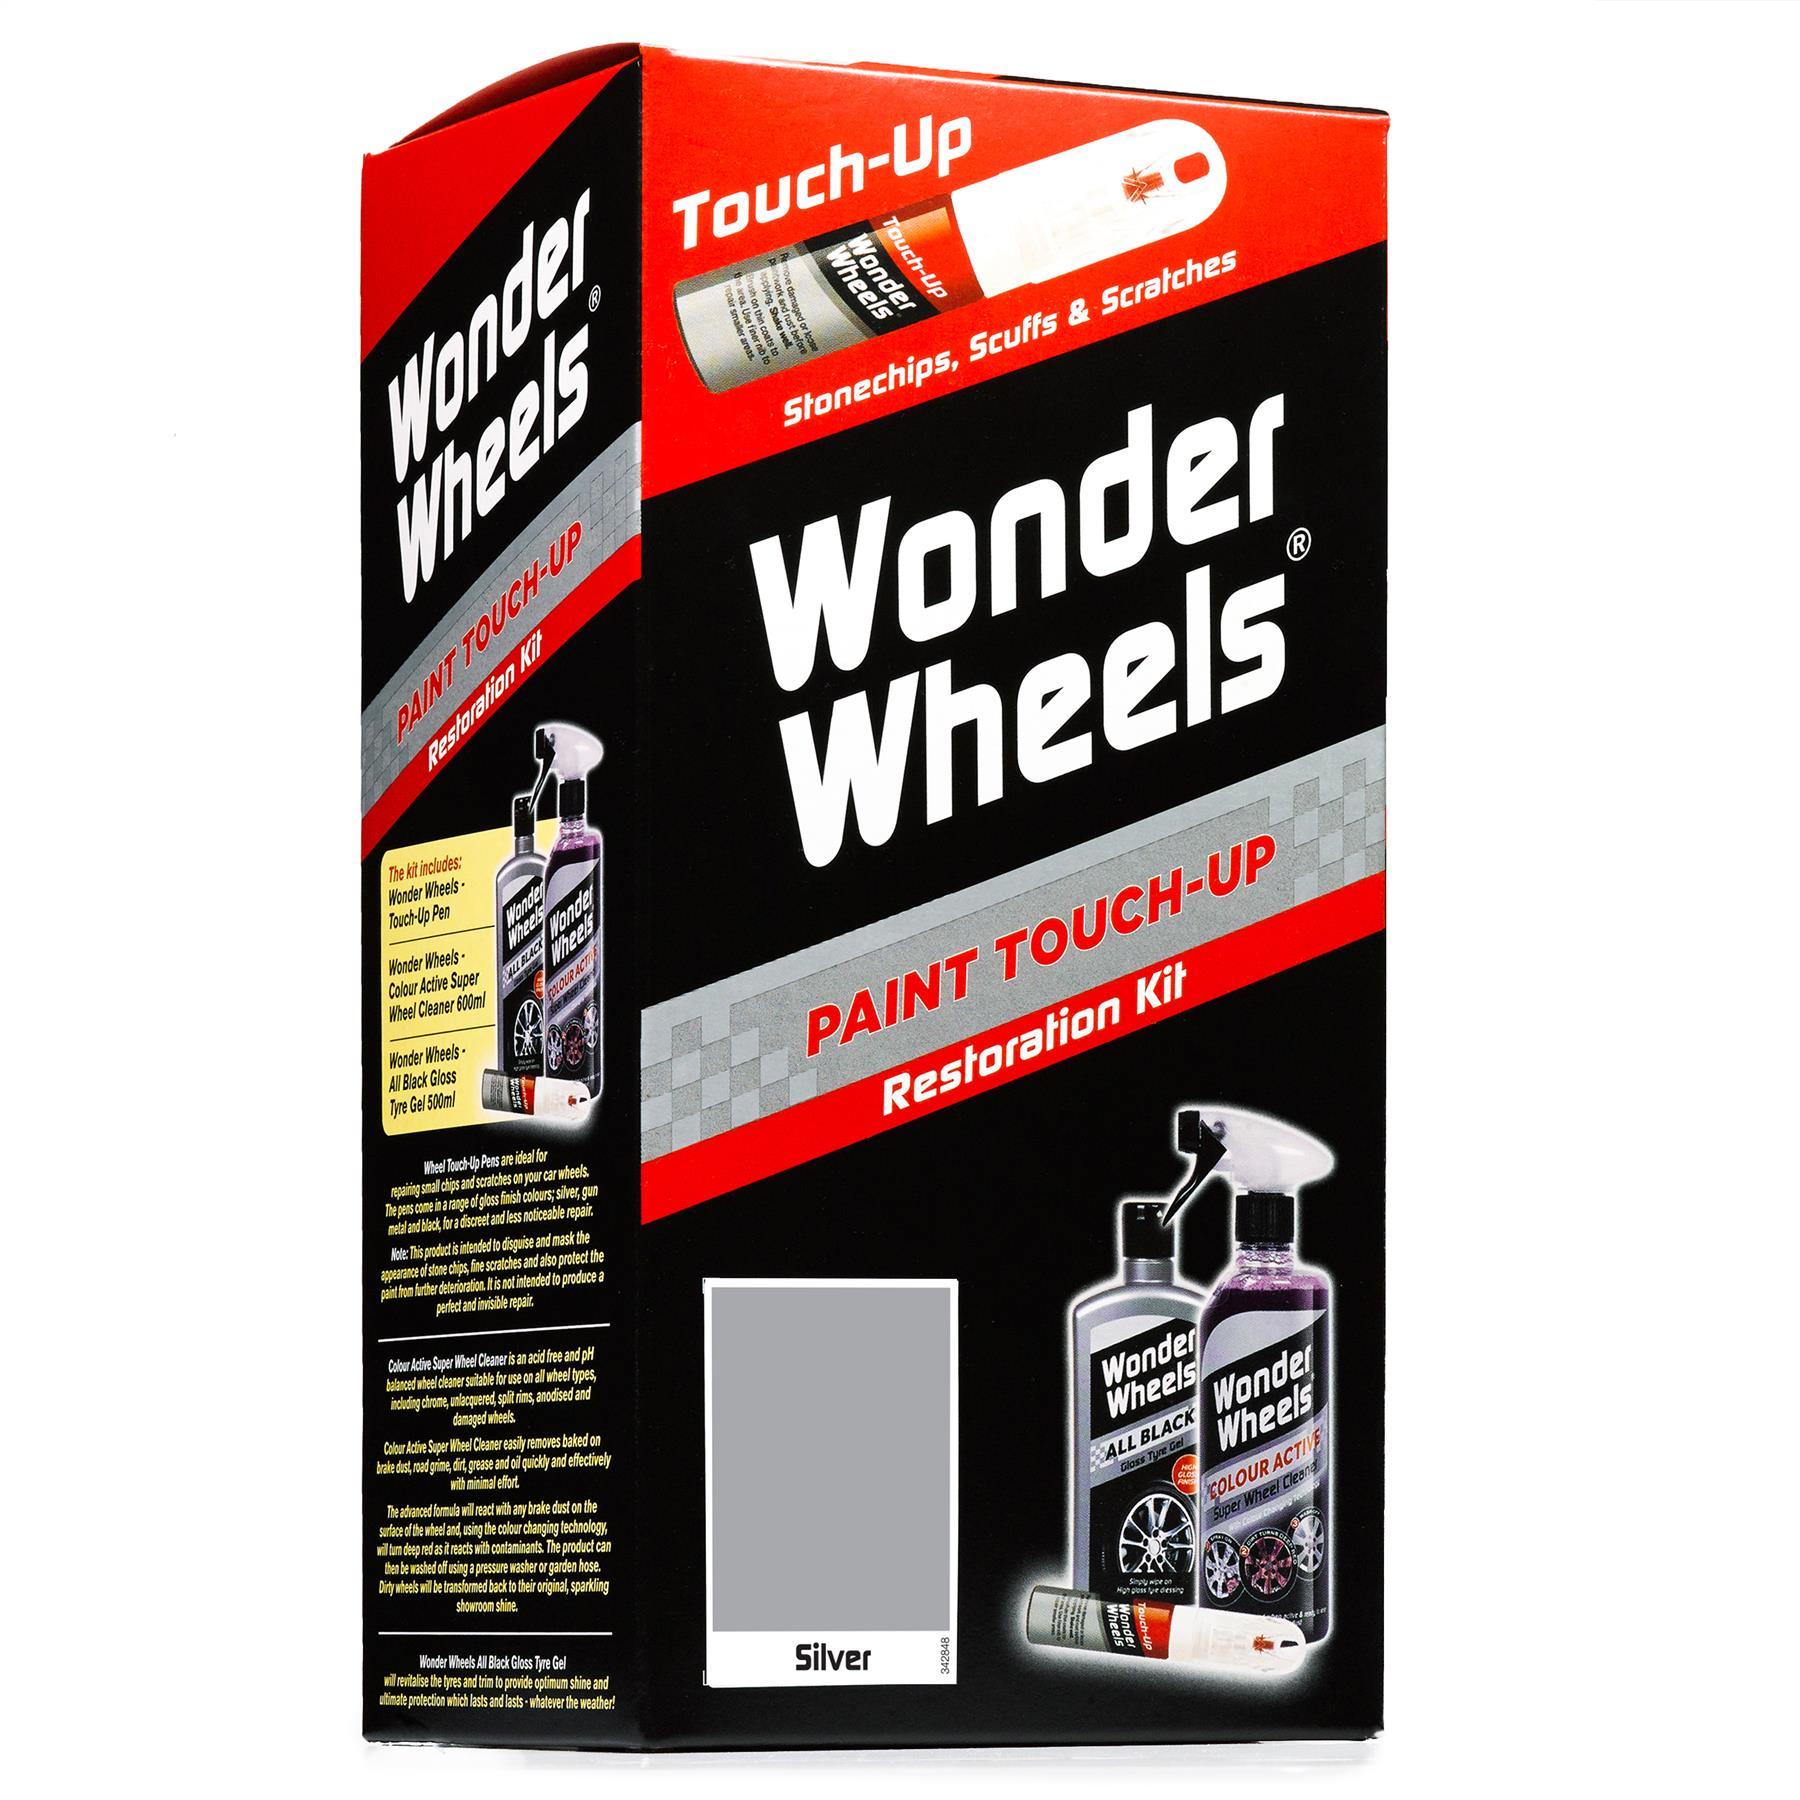 thumbnail 19 - Wonder-Wheels-Paint-Touch-Up-Restoration-Kit